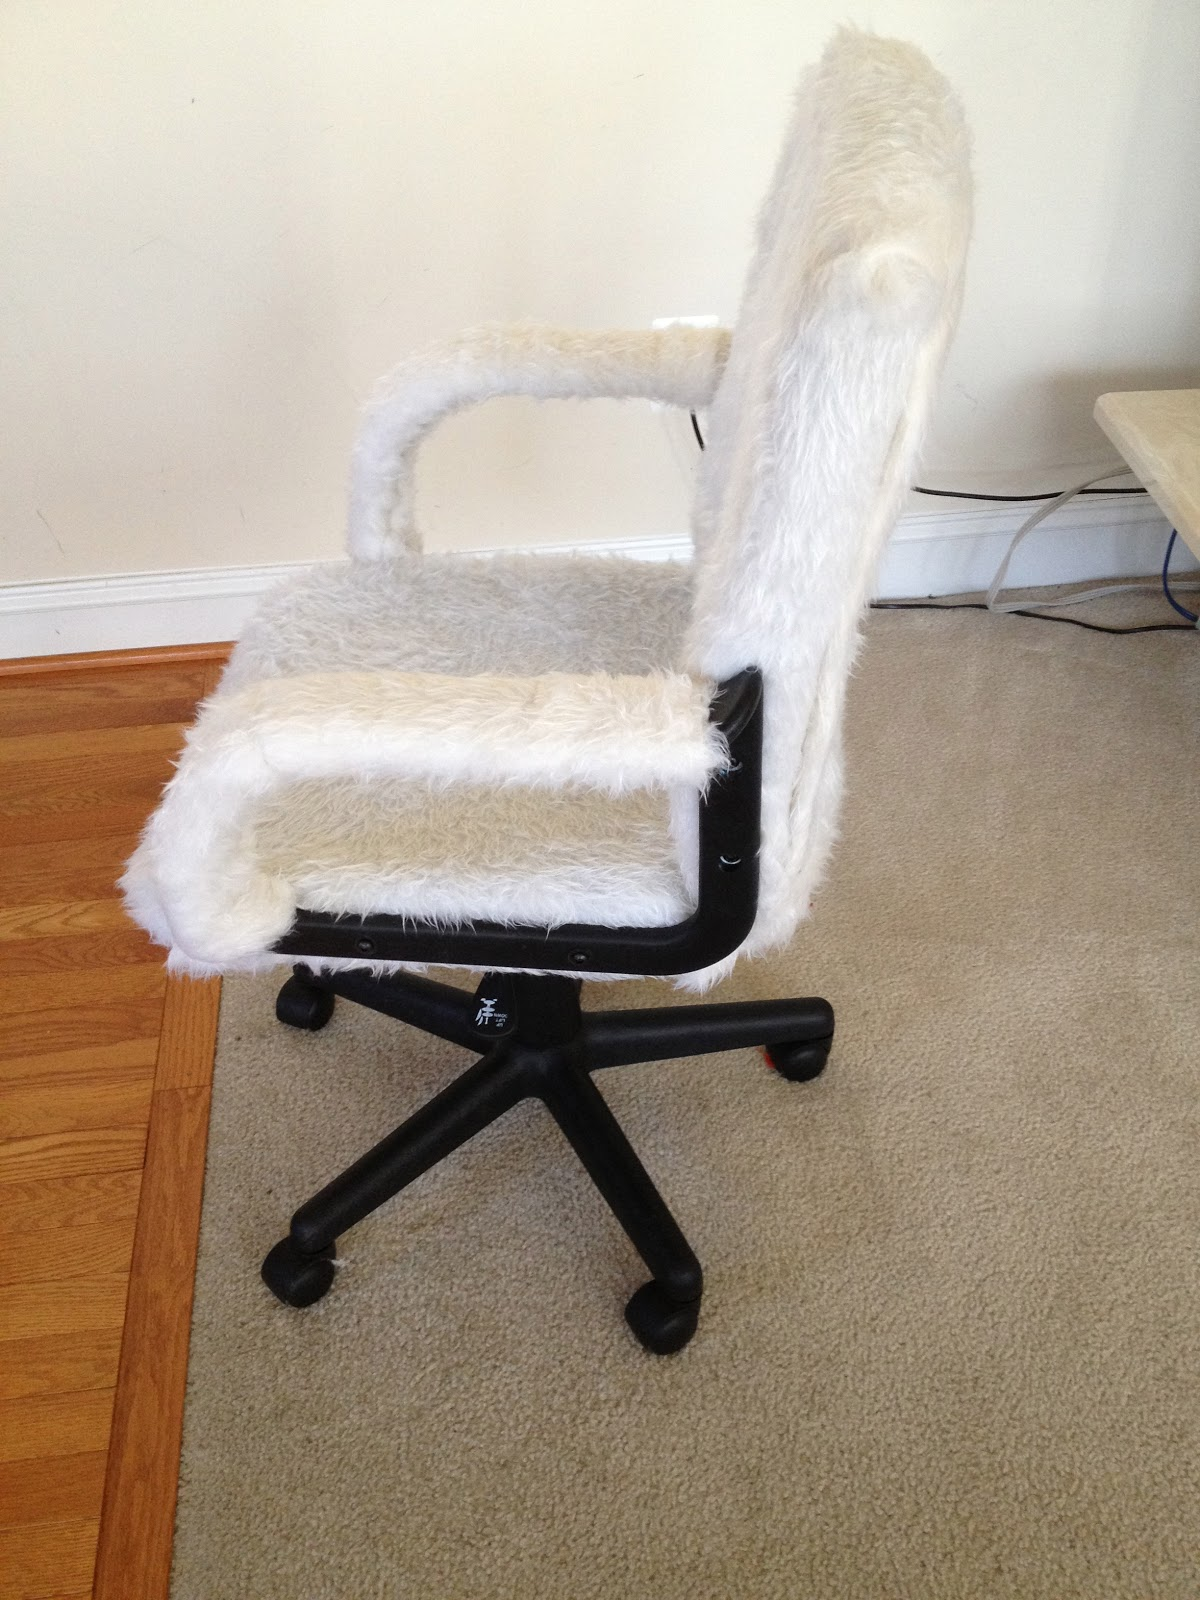 Reupholster Office Chair Back Wishbone Chairs Overstock An Luxe Millennial